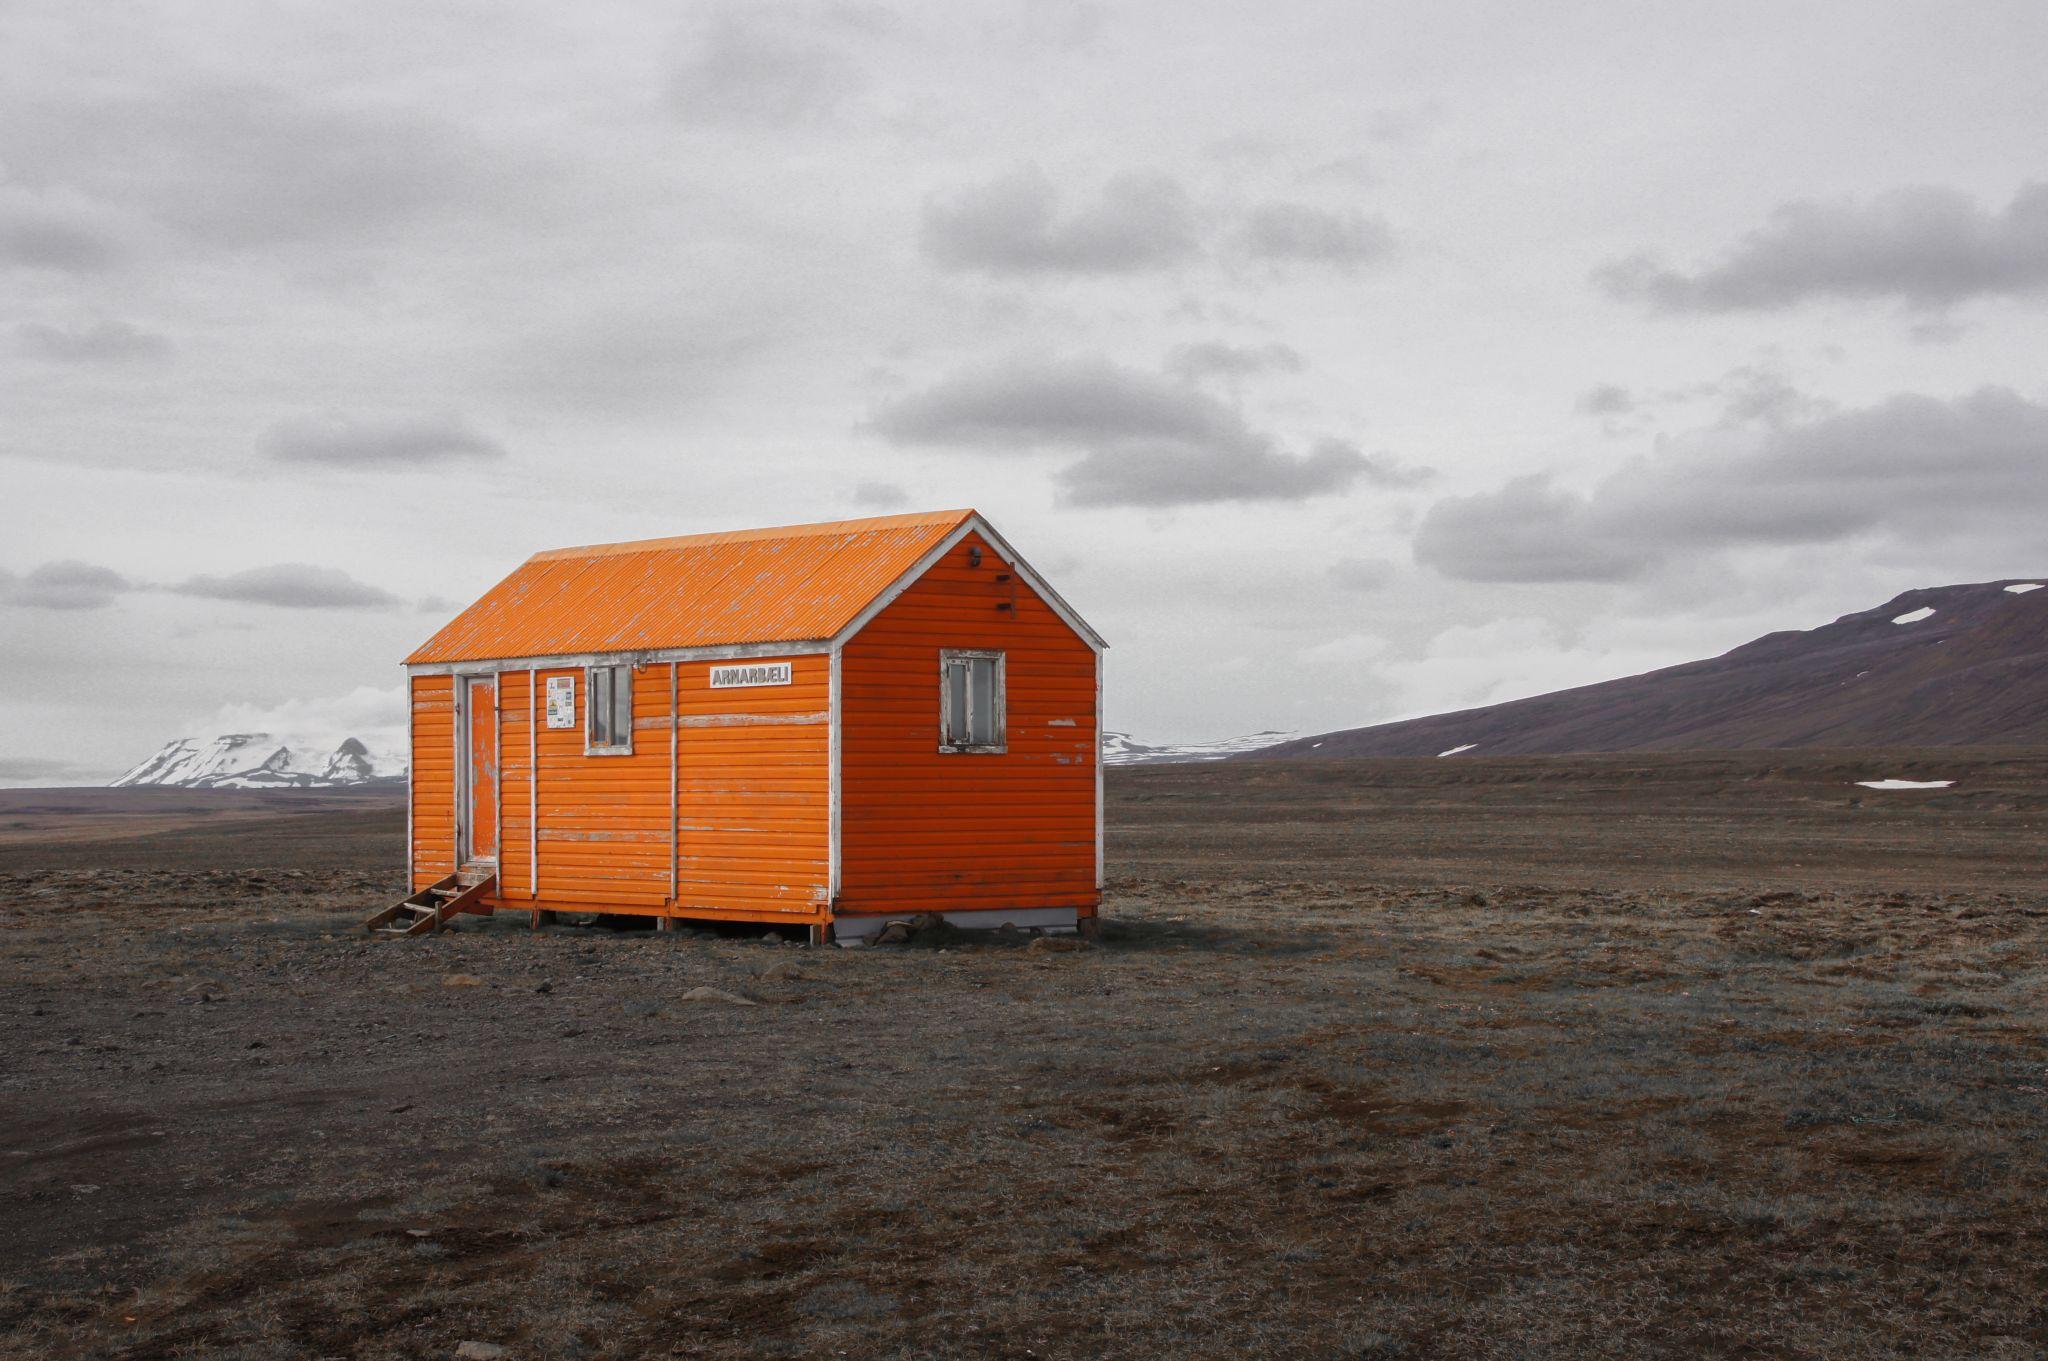 Arnarbaeli Rescue Hut, Iceland